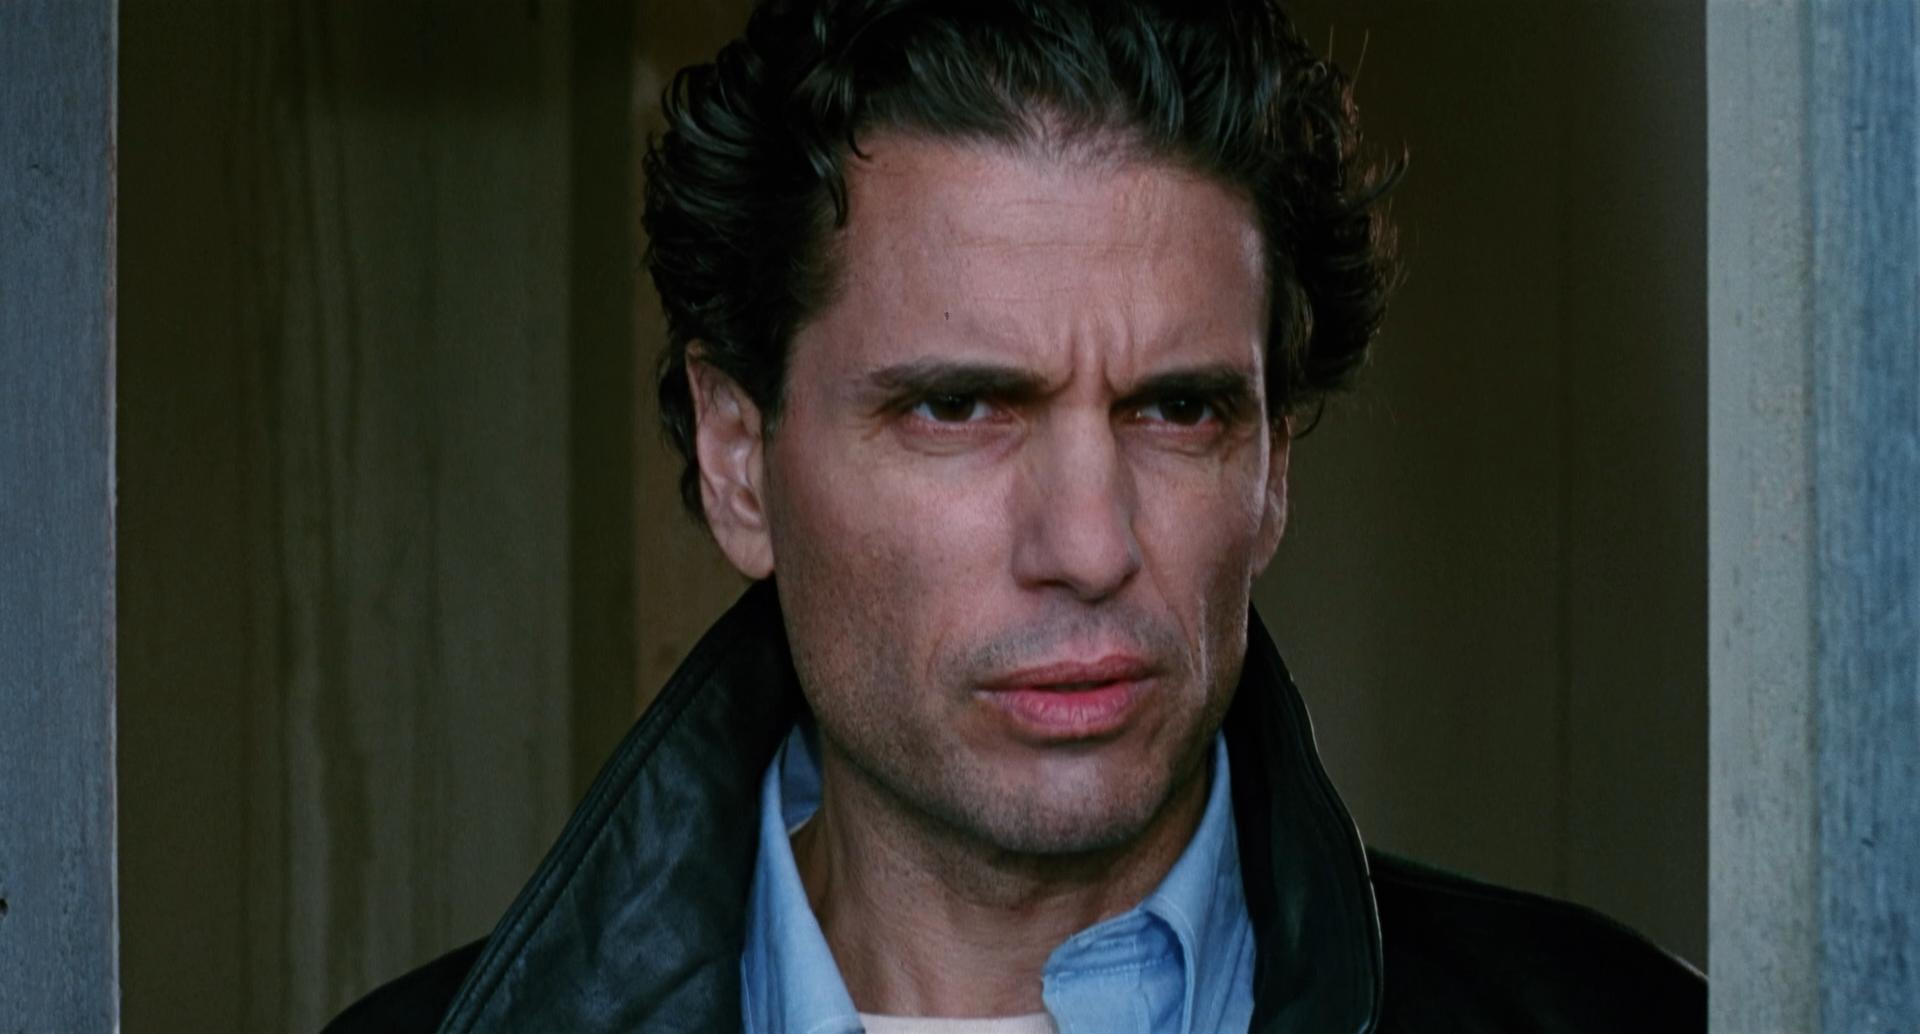 Chris Sarandon in The Resurrected (1991)